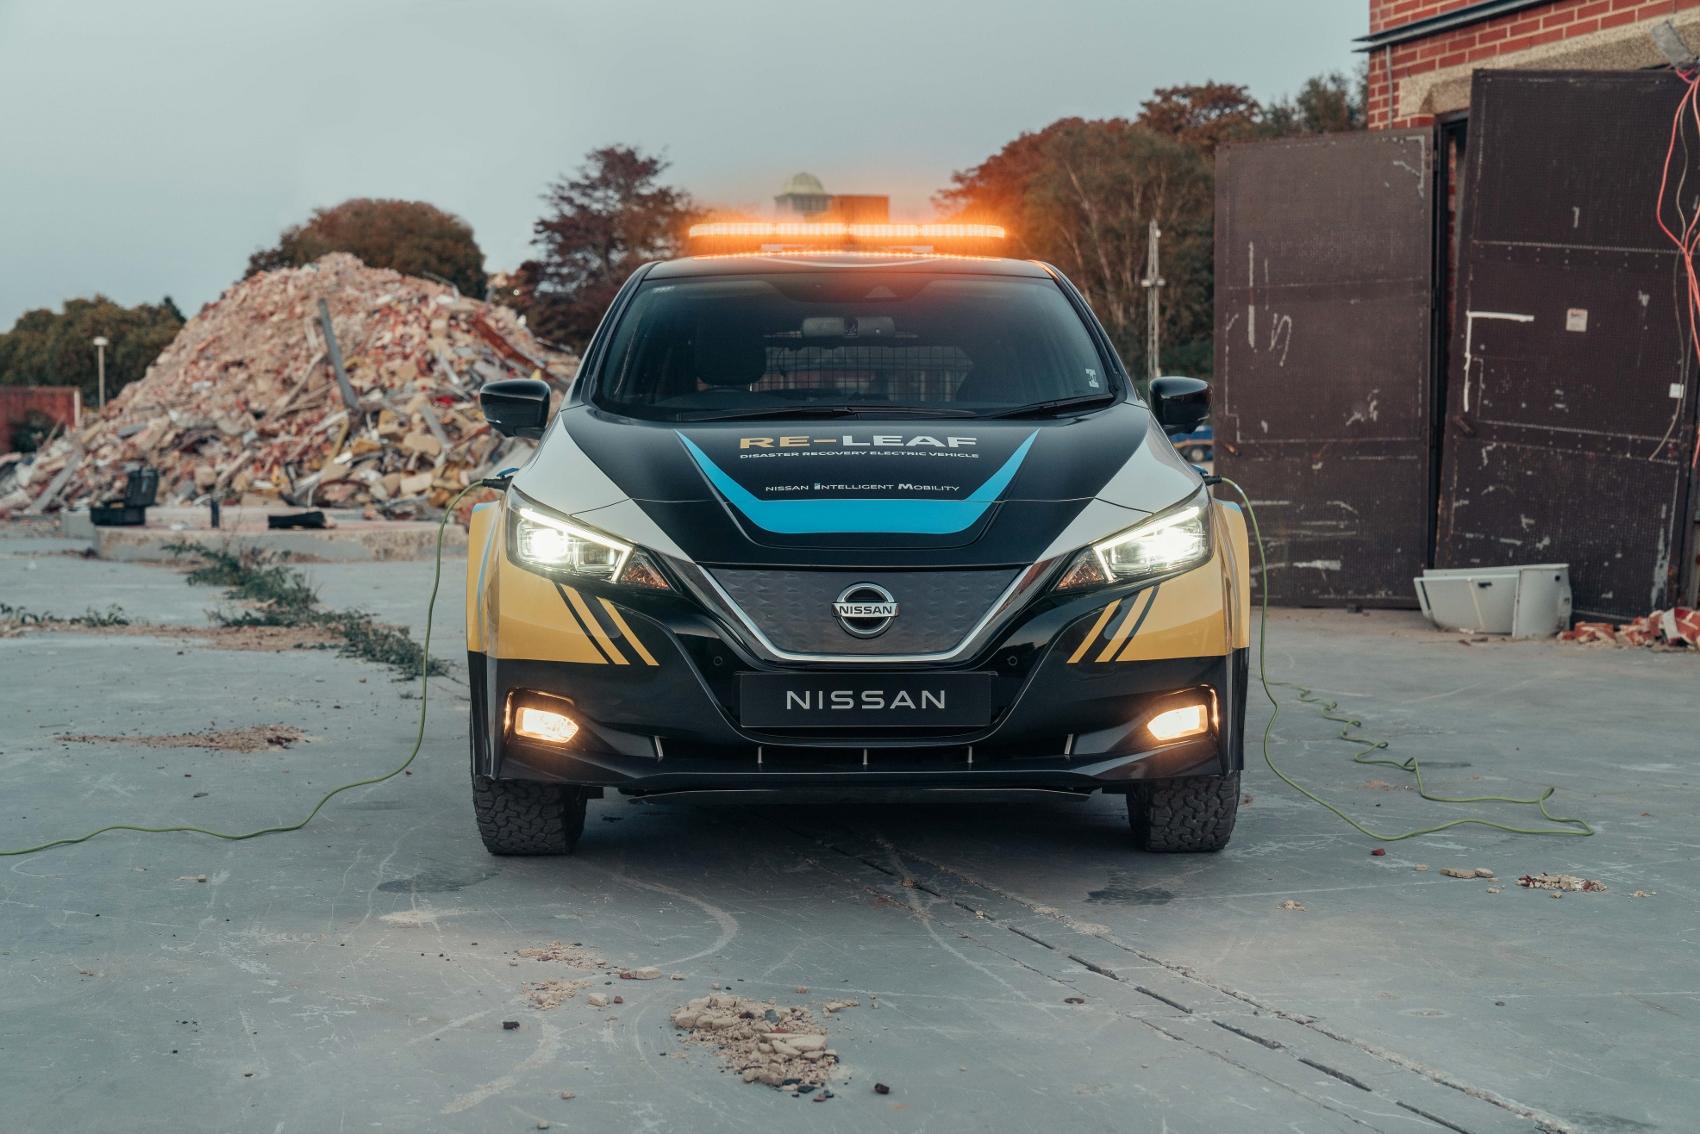 Nissan RE-Leaf je určený na zásahy po katastrofách FO2Hz0PfjI nissanre-leaf2-1700x1134